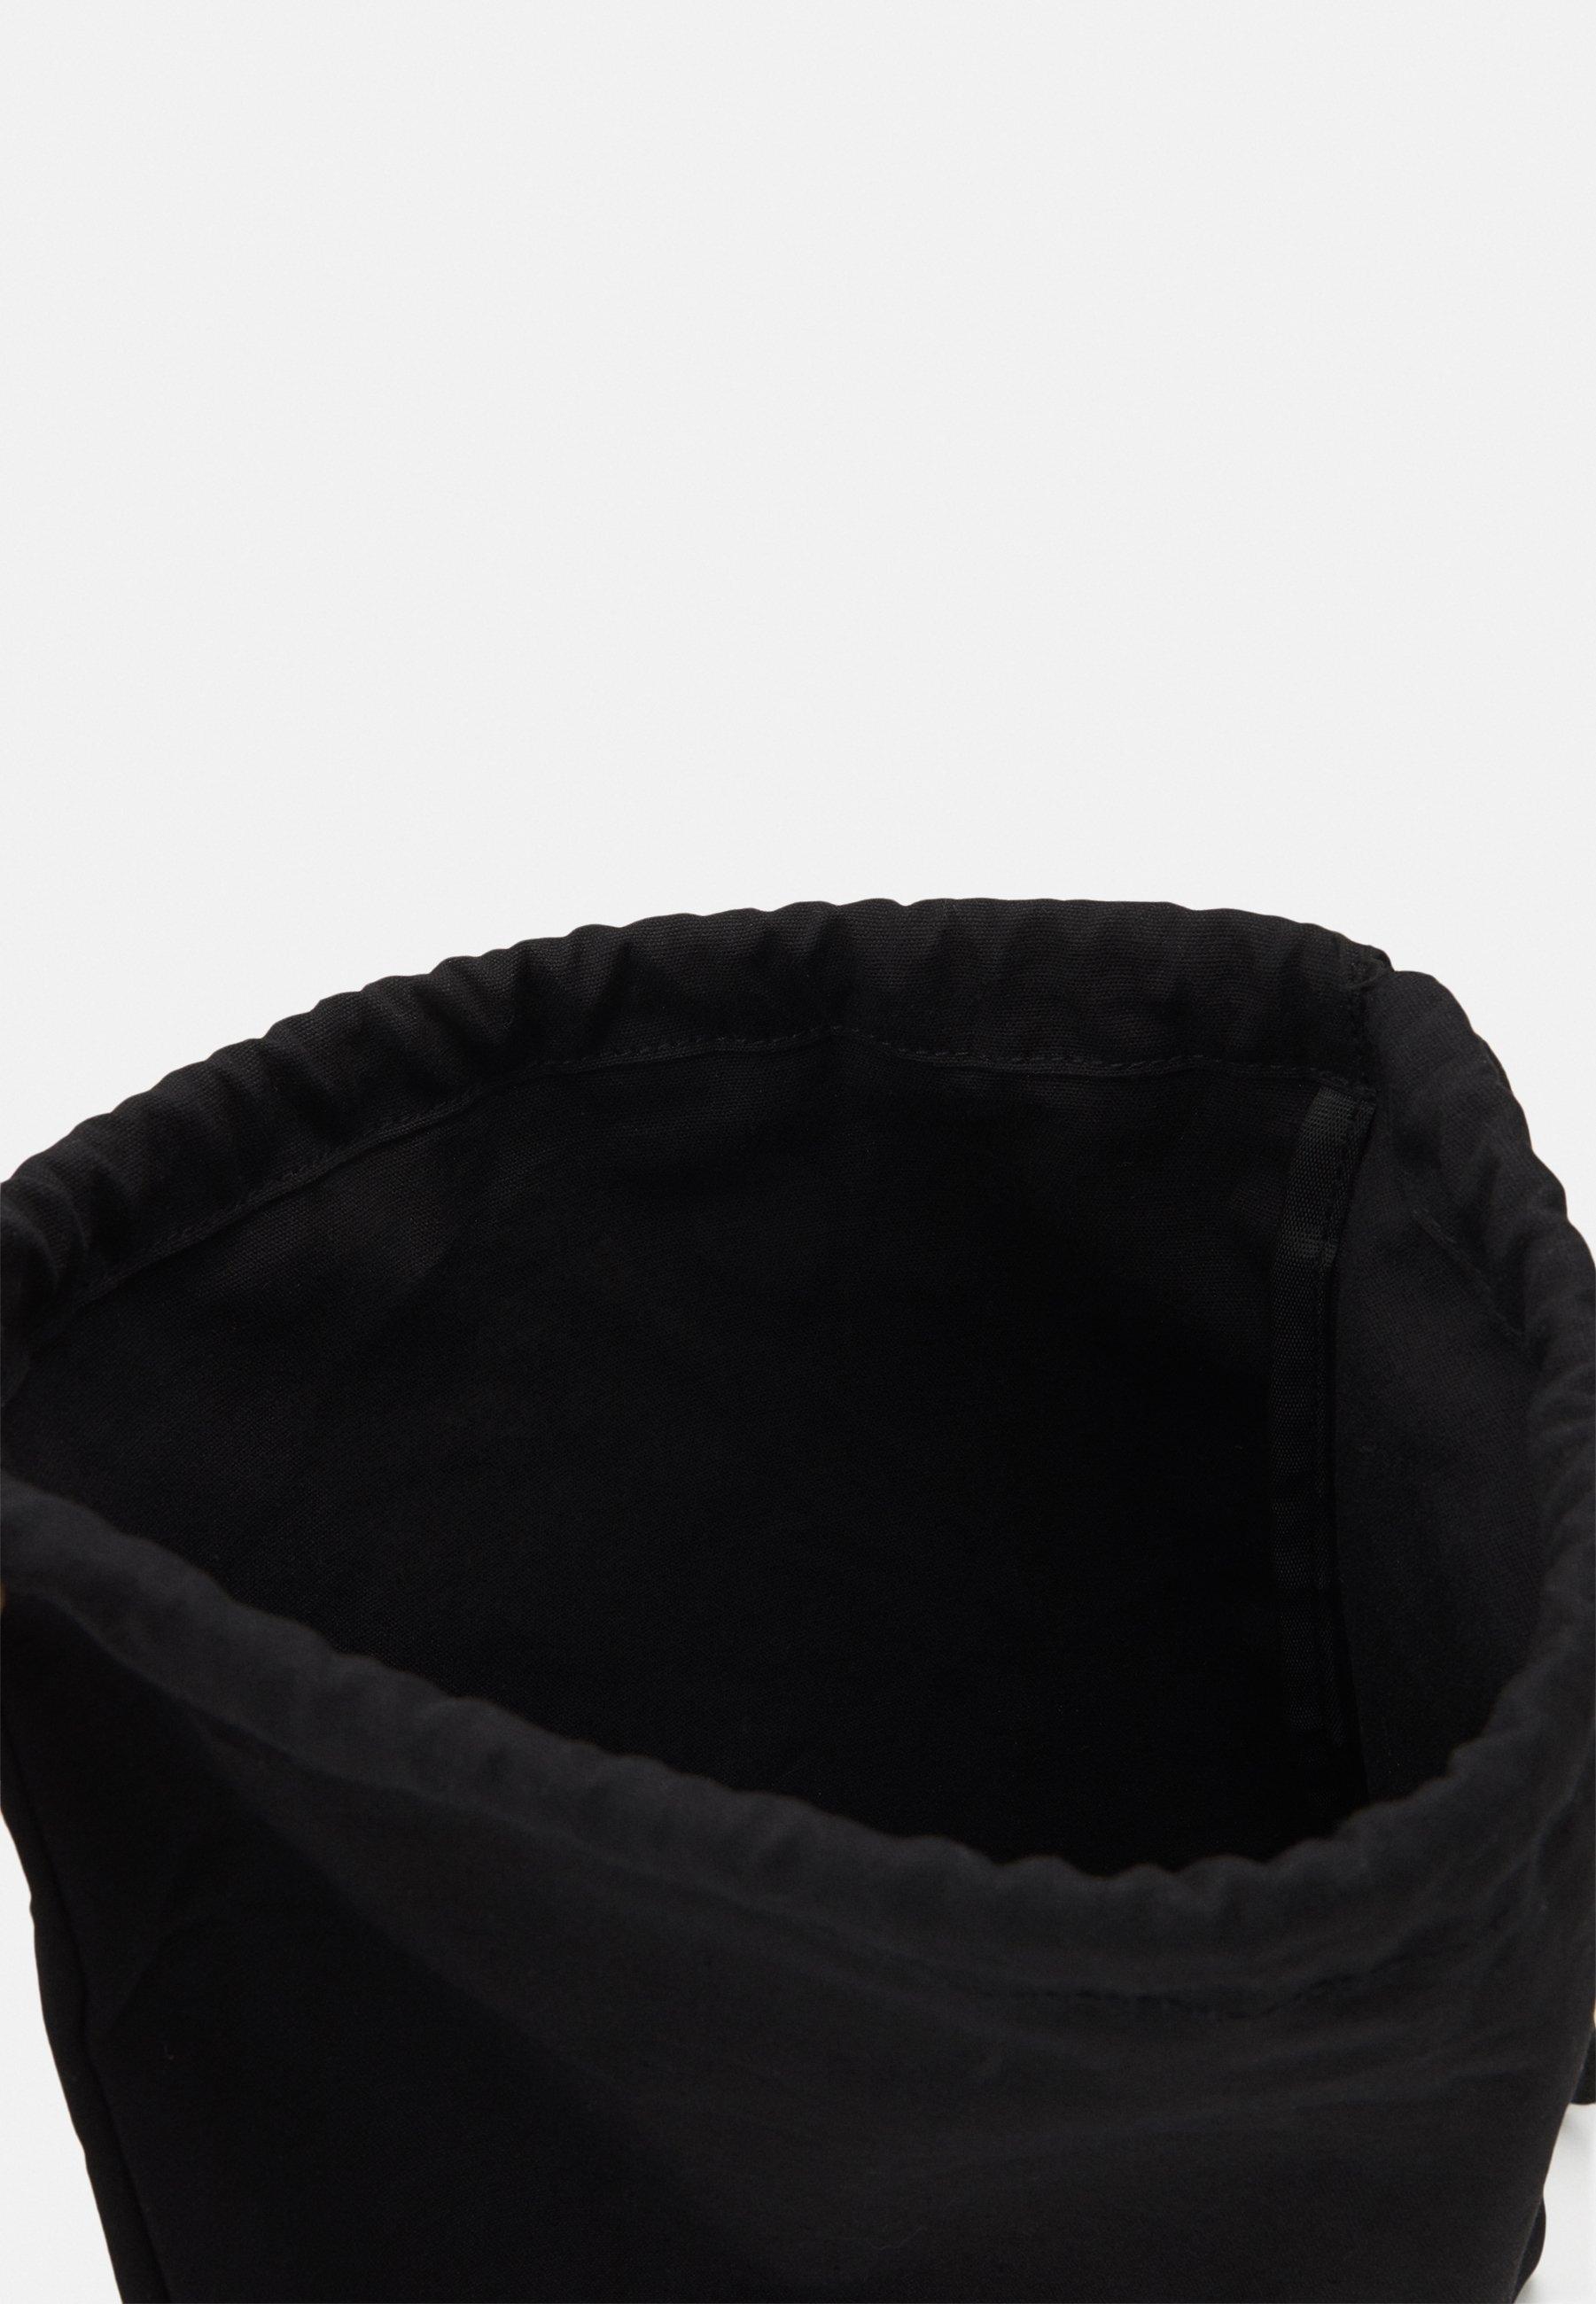 Kids FALLO DRAWSTRING BAG UNISEX - Drawstring sports bag